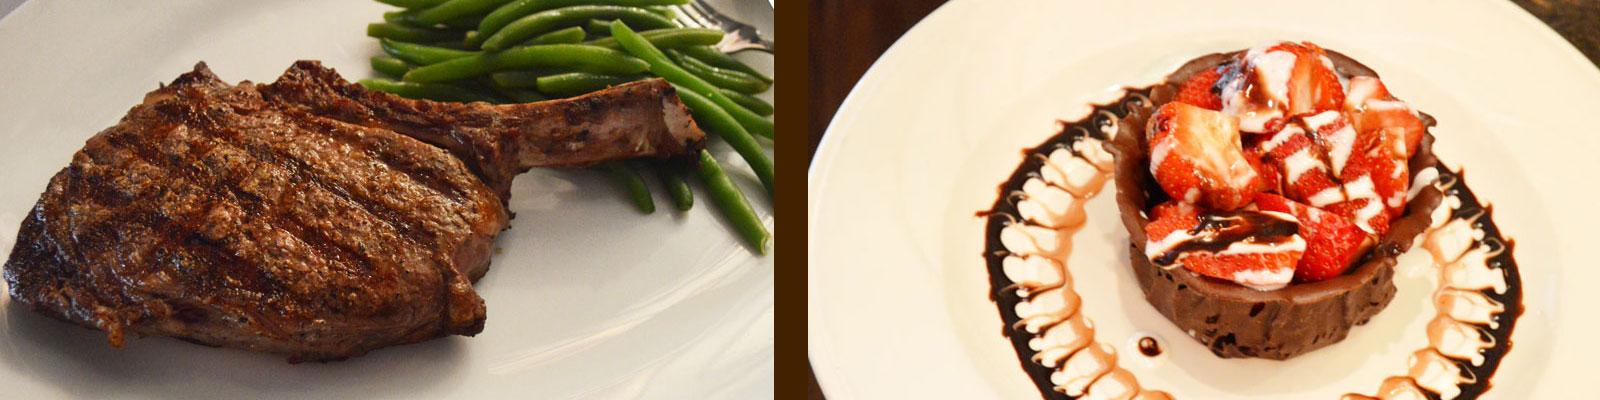 steak and chocolate dessert